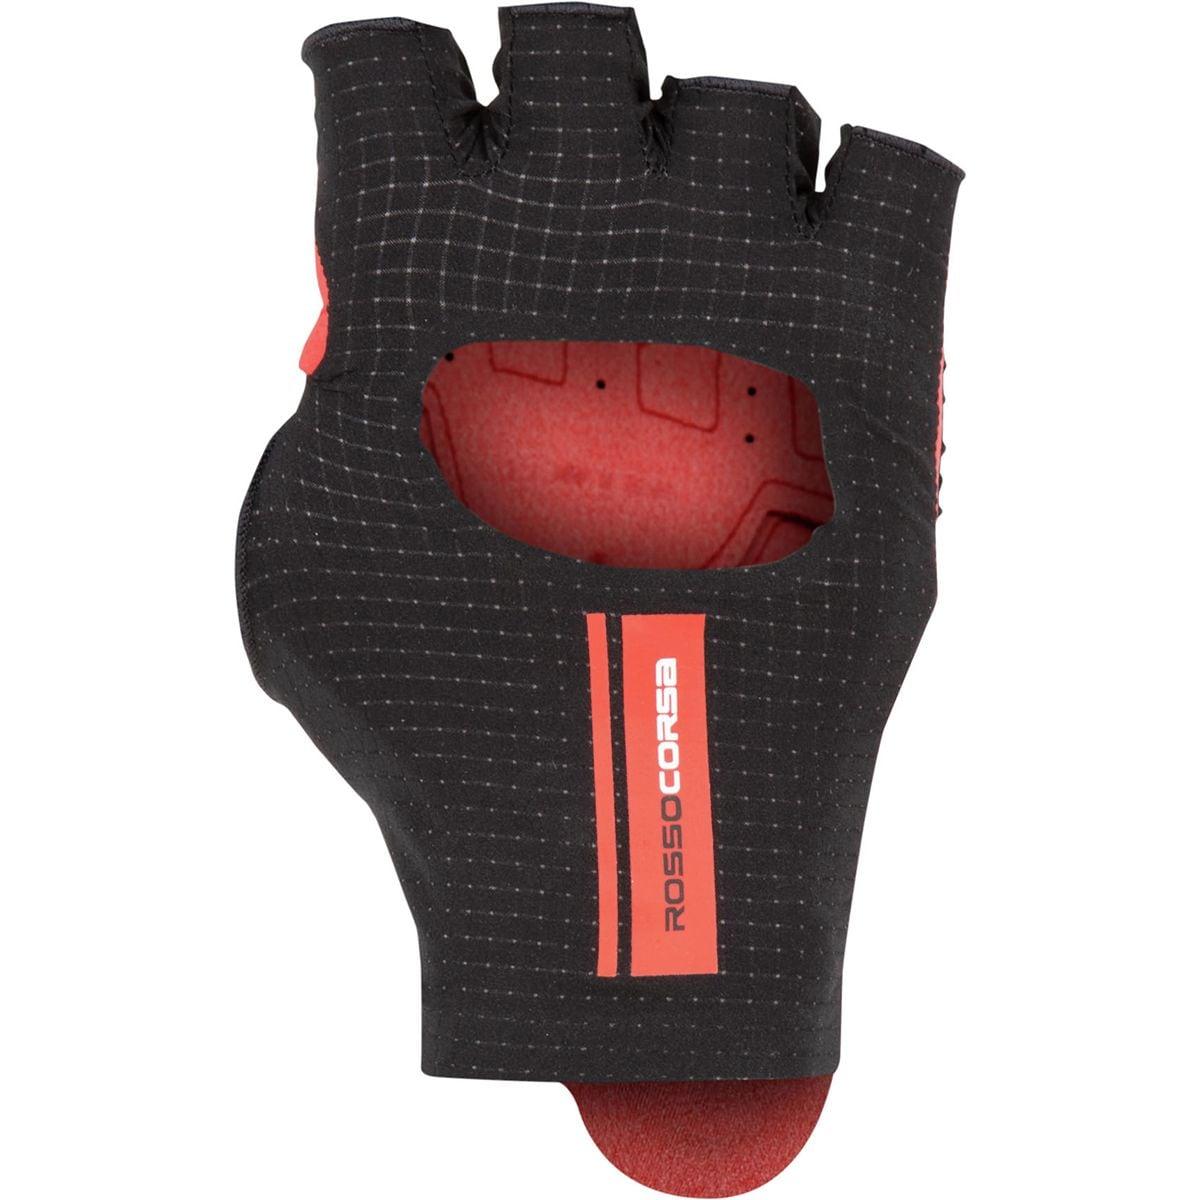 Castelli-Cabrio-Glove-Men-039-s miniature 19